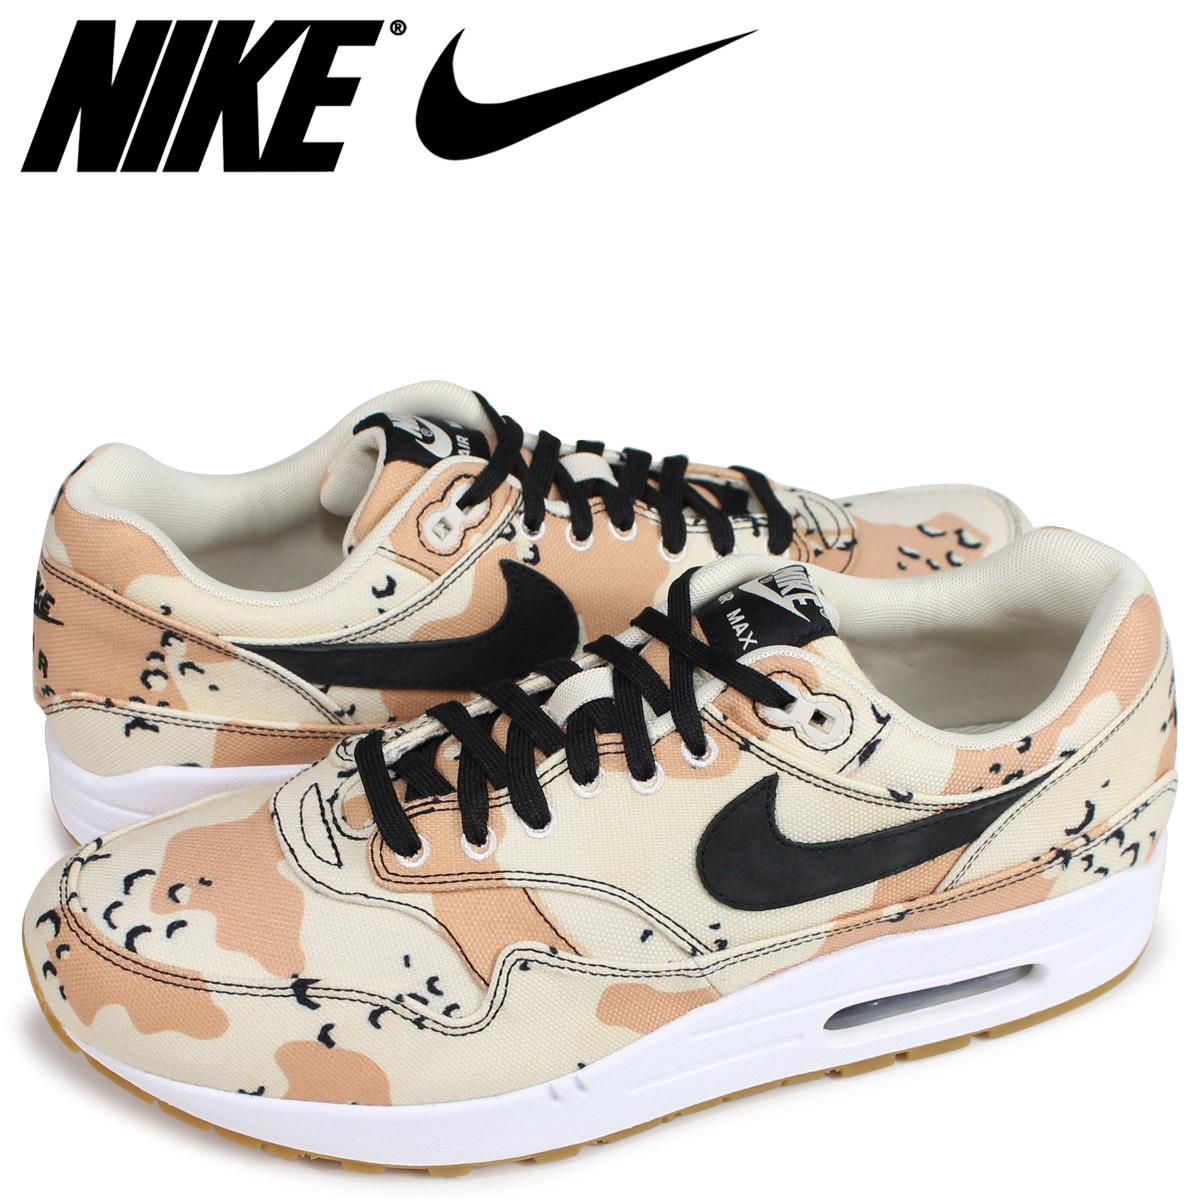 SneaK Online Shop | Rakuten Global Market: Nike NIKE Air Max 1 sneakers men AIR MAX 1 PREMIUM BEACH CAMO 875,844-204 beige [load planned Shinnyu load in reservation product 7/19 containing]